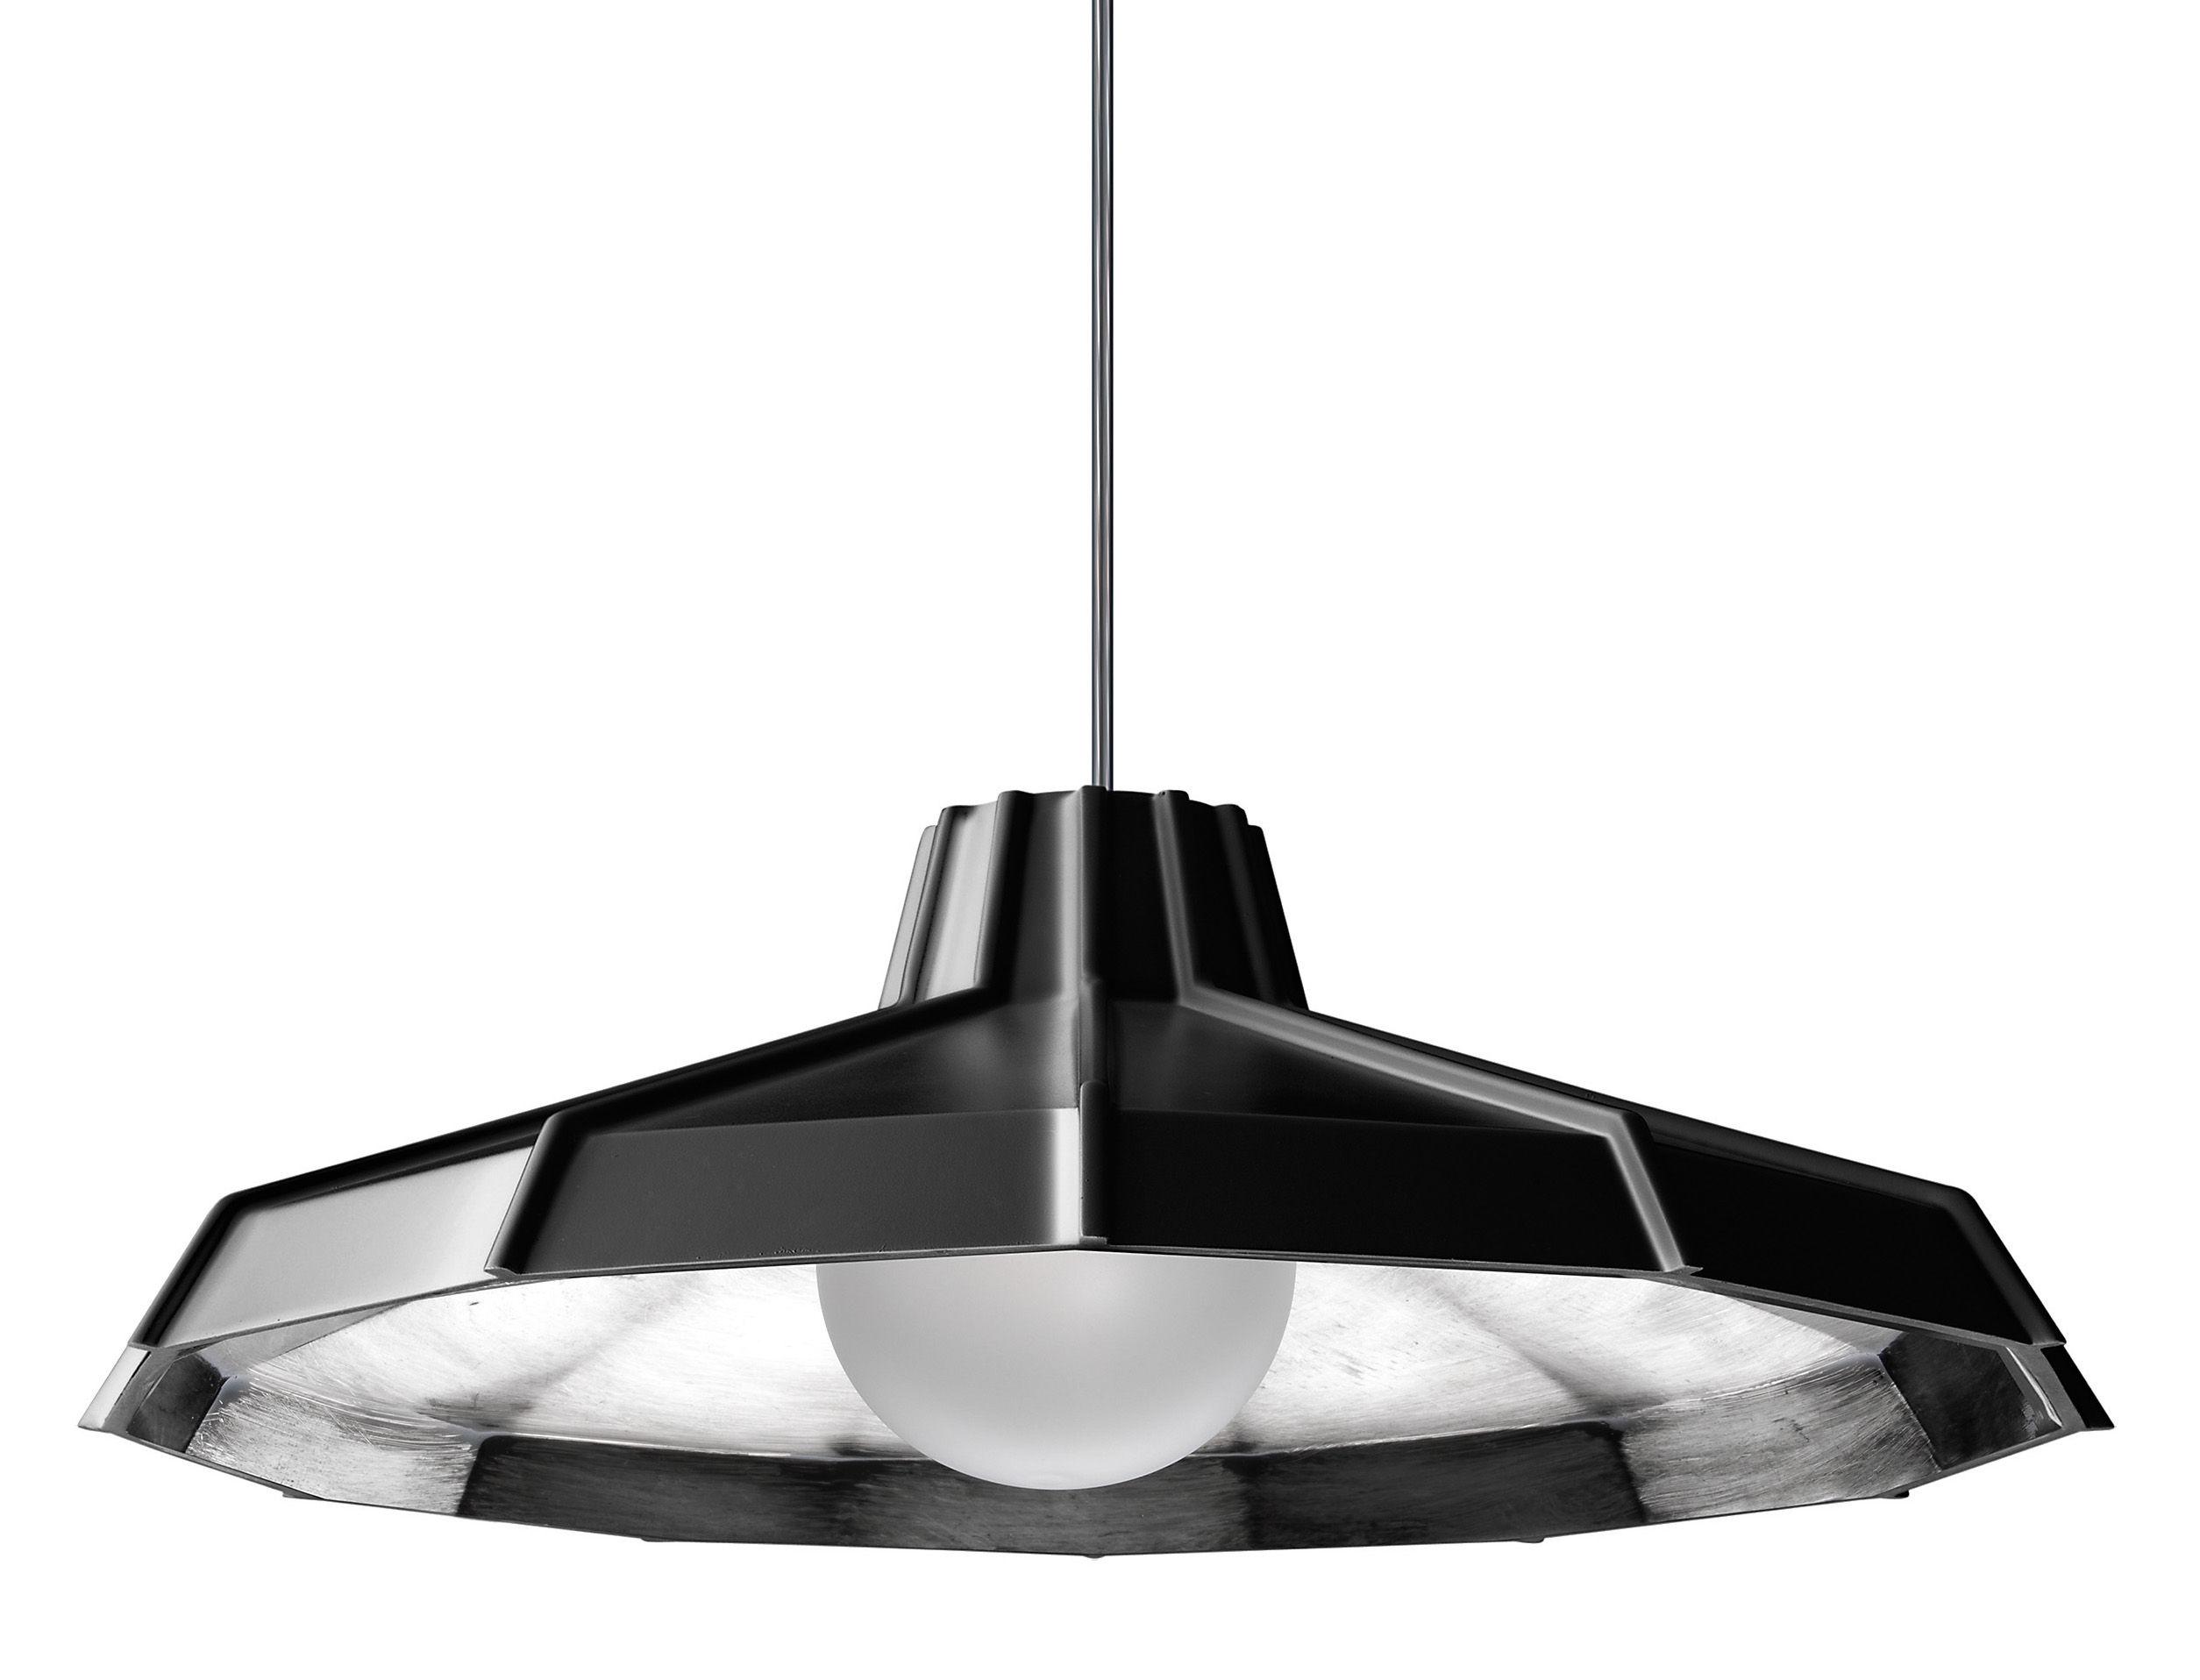 Luminaire - Suspensions - Suspension Mysterio Ø 31 cm - Diesel with Foscarini - Noir / Argent - Polycarbonate